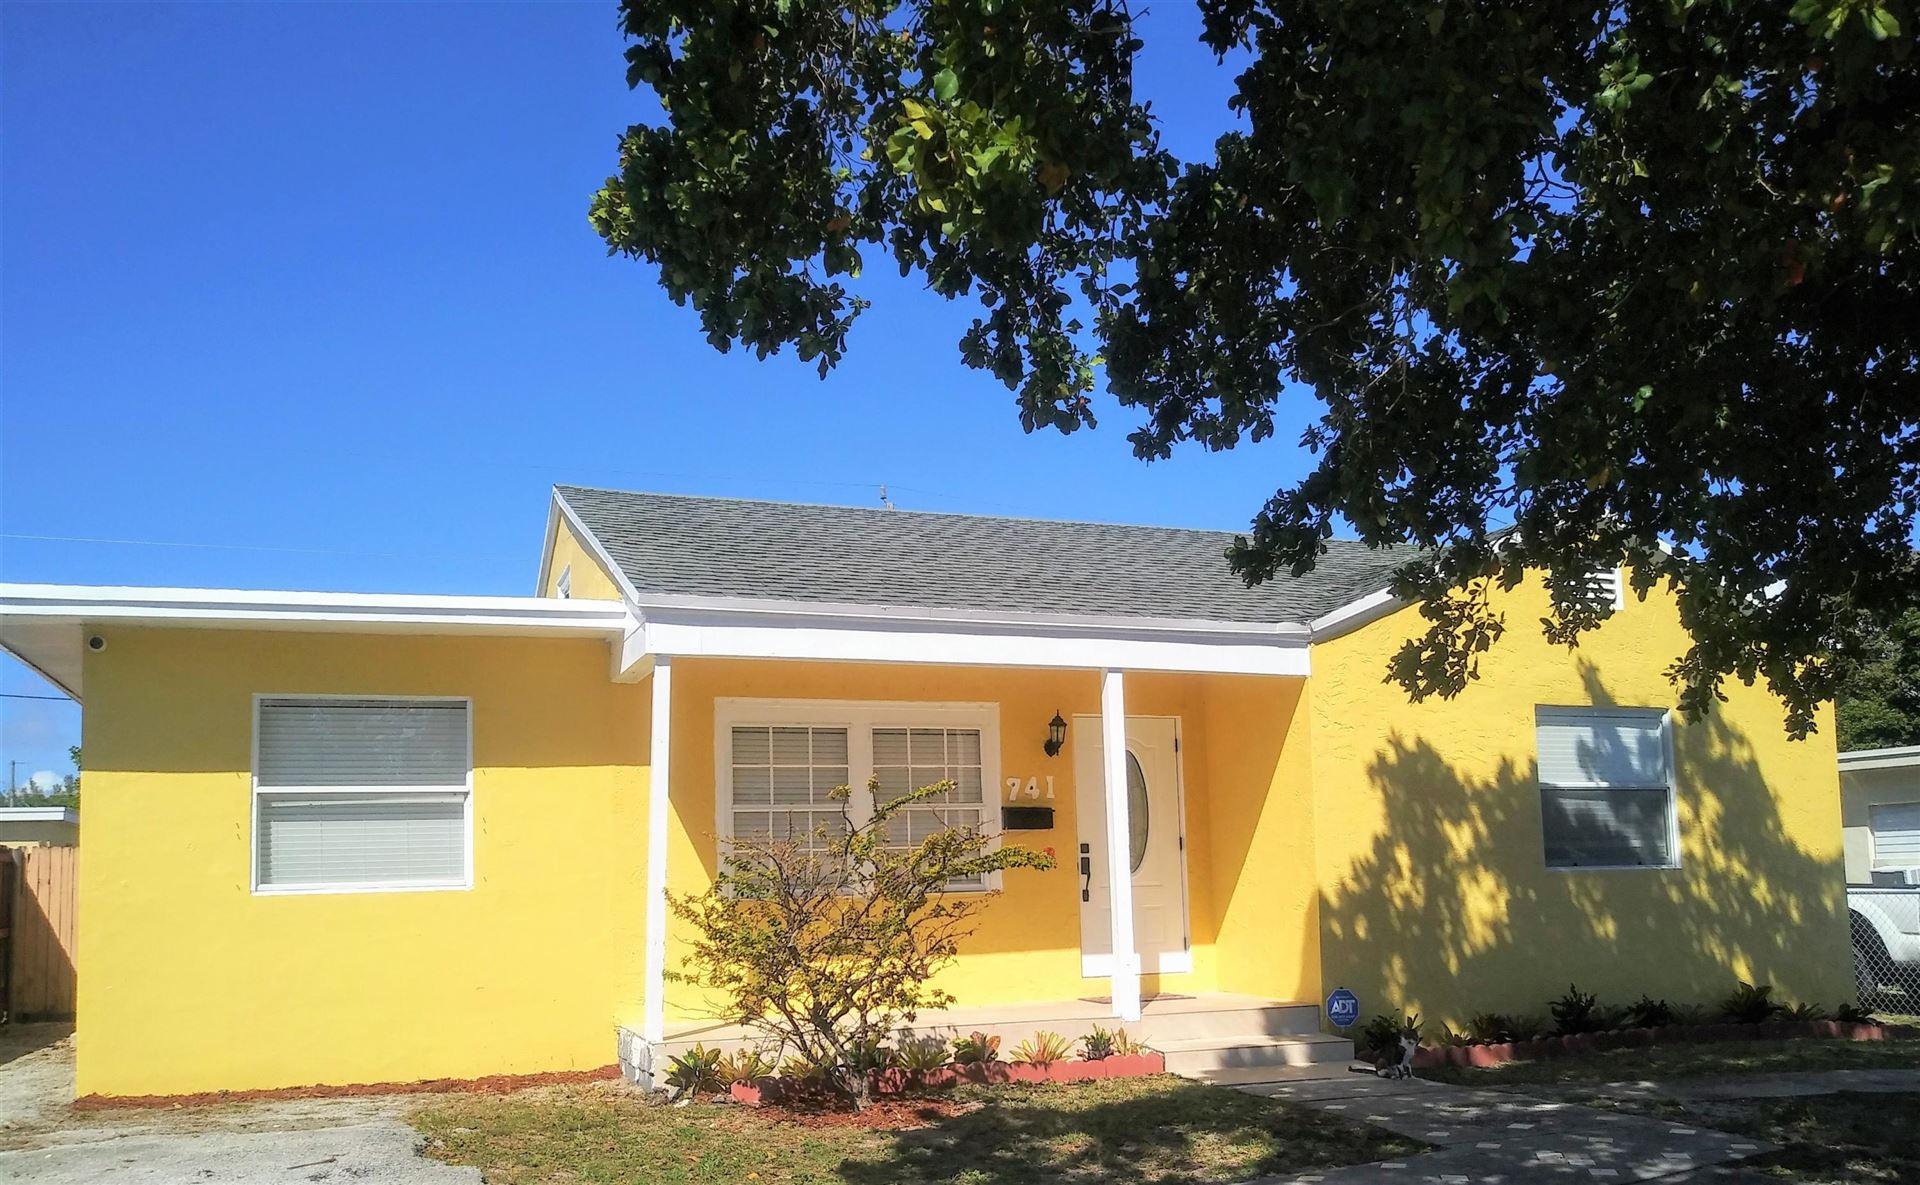 741 42nd Street, West Palm Beach, FL 33407 - #: RX-10695950